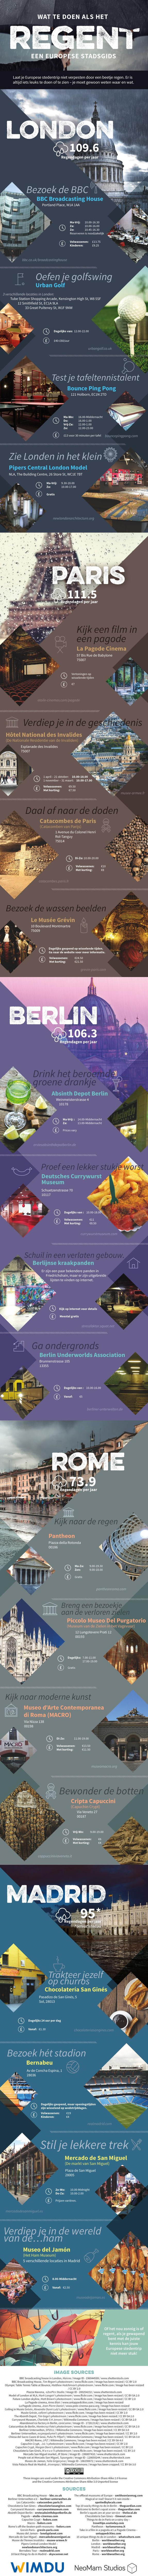 tips-regen-stedentrip